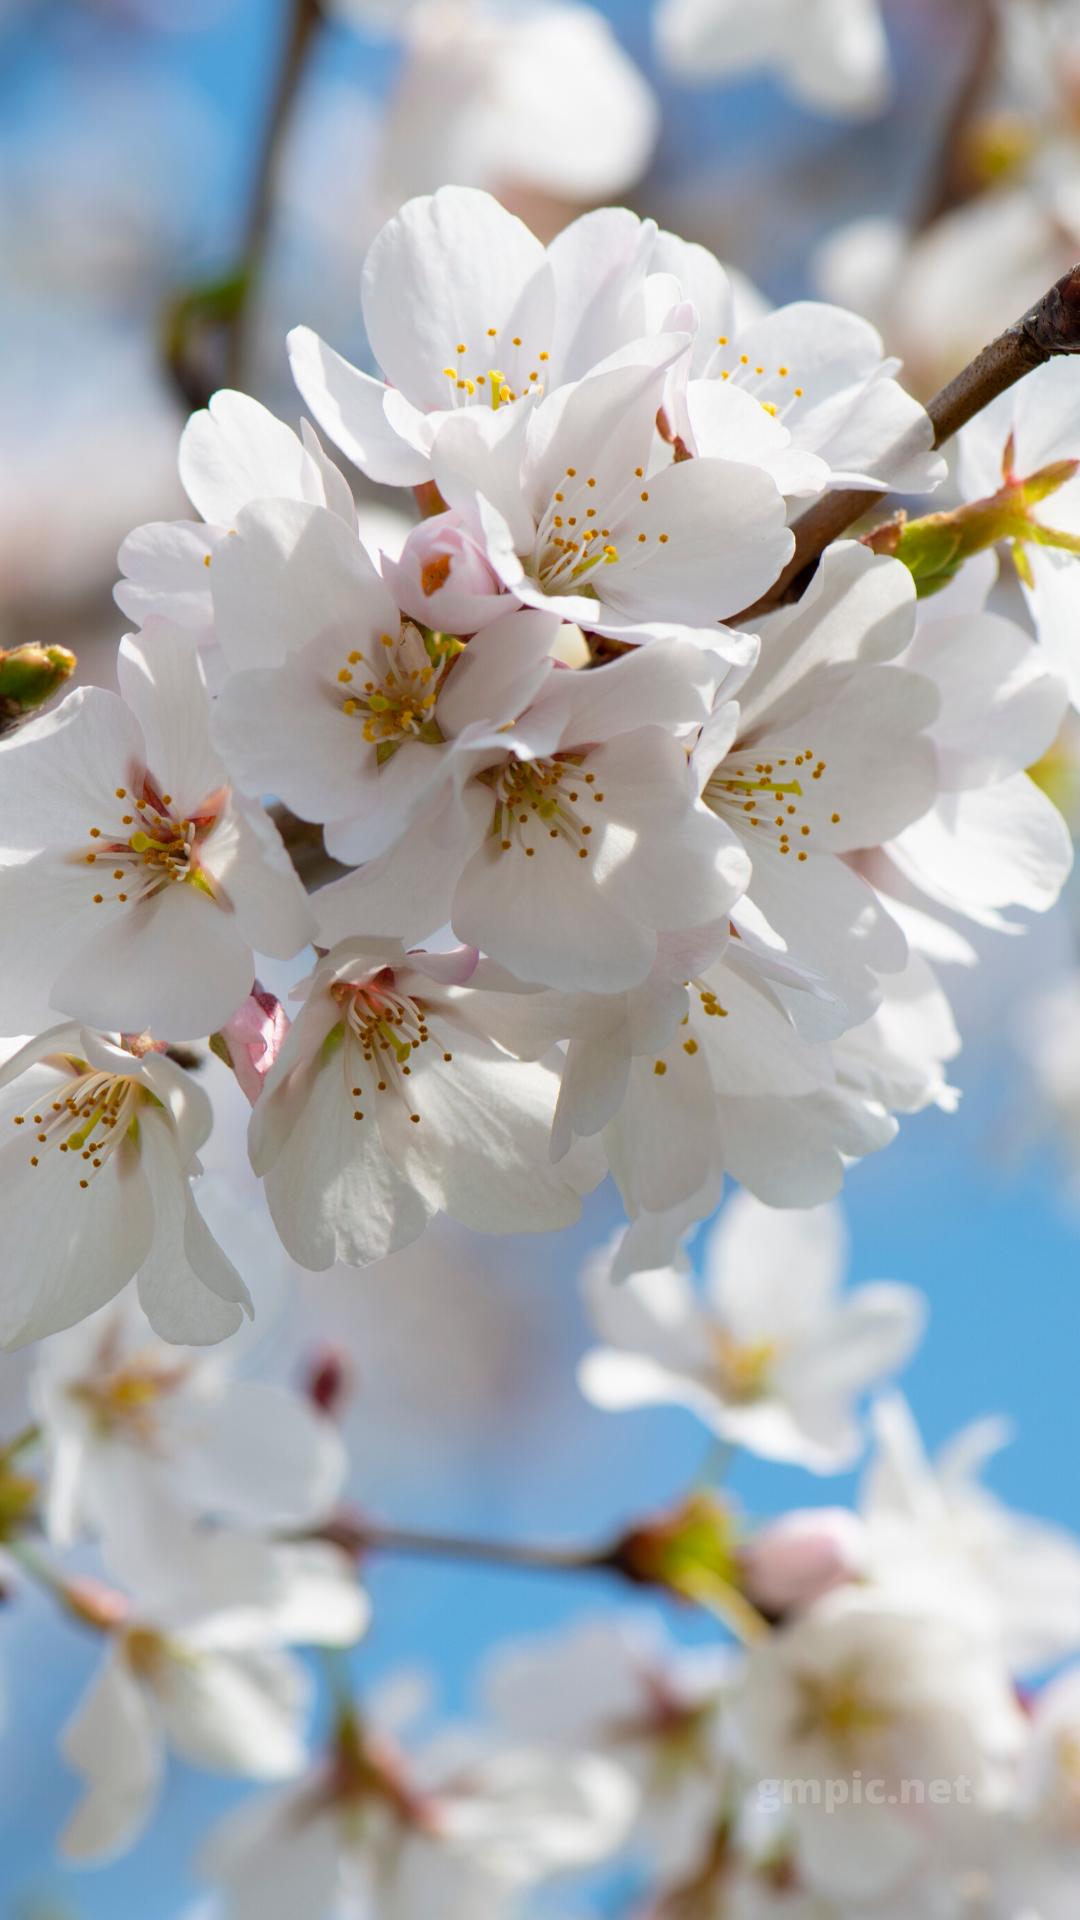 Hd Spring Wallpaper Download In 2020 Spring Wallpaper Spring Flowers Wallpaper Spring Desktop Wallpaper